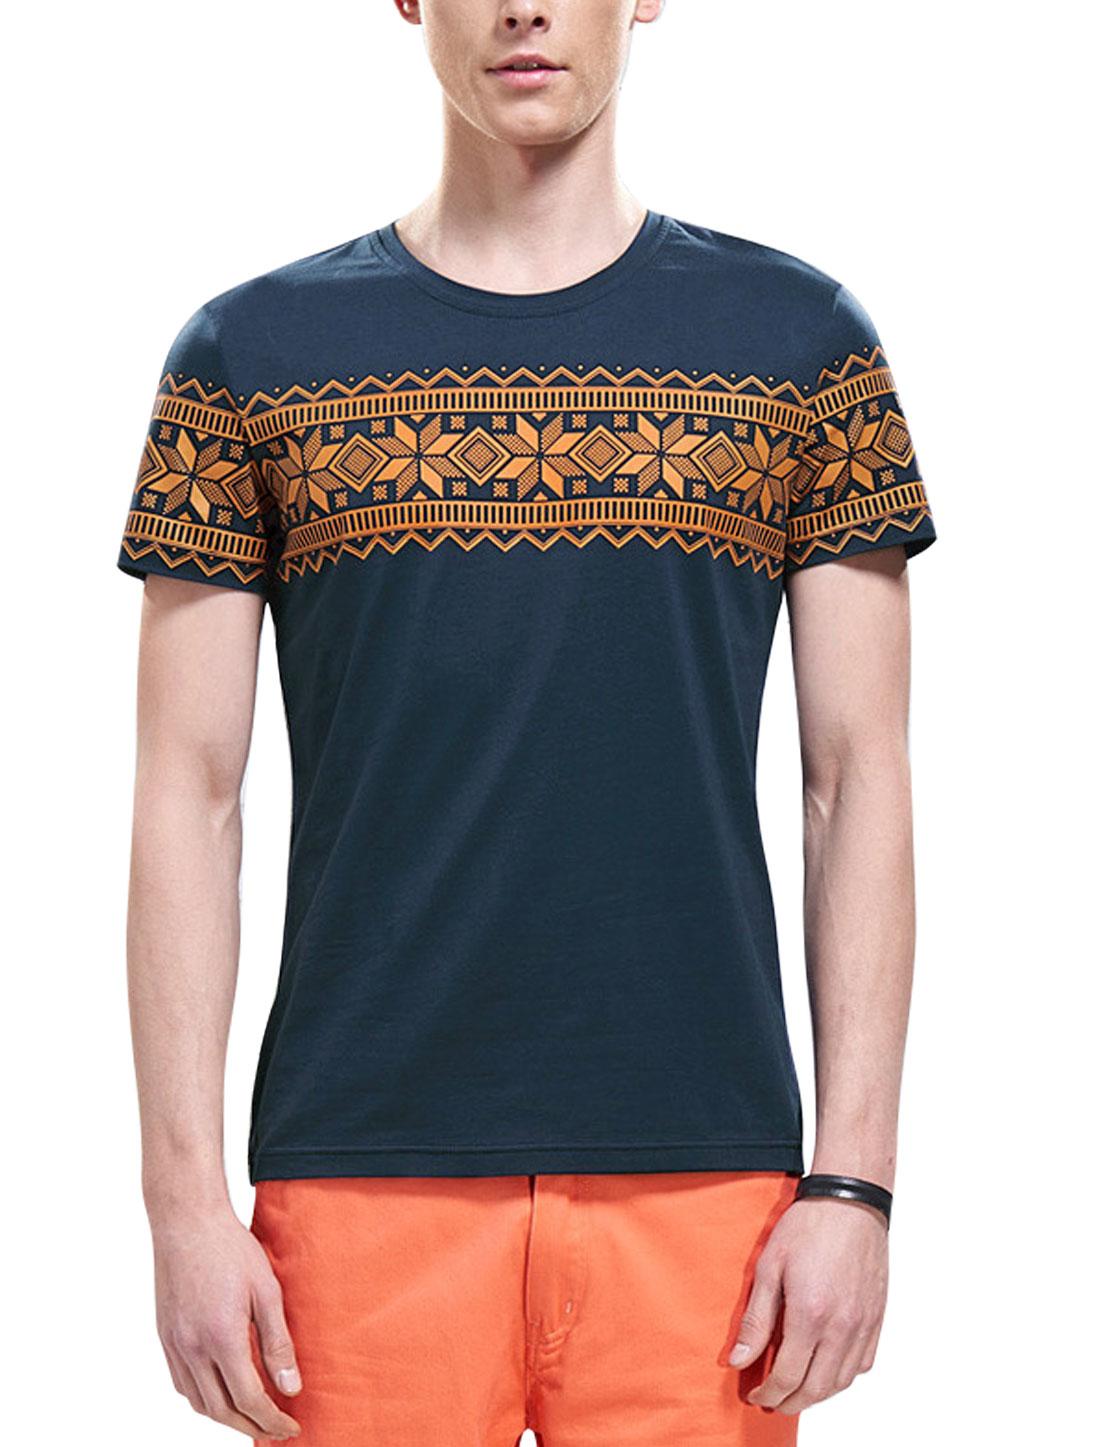 Men Short Sleeves Geometric Prints Slipover T-Shirts Navy Blue M